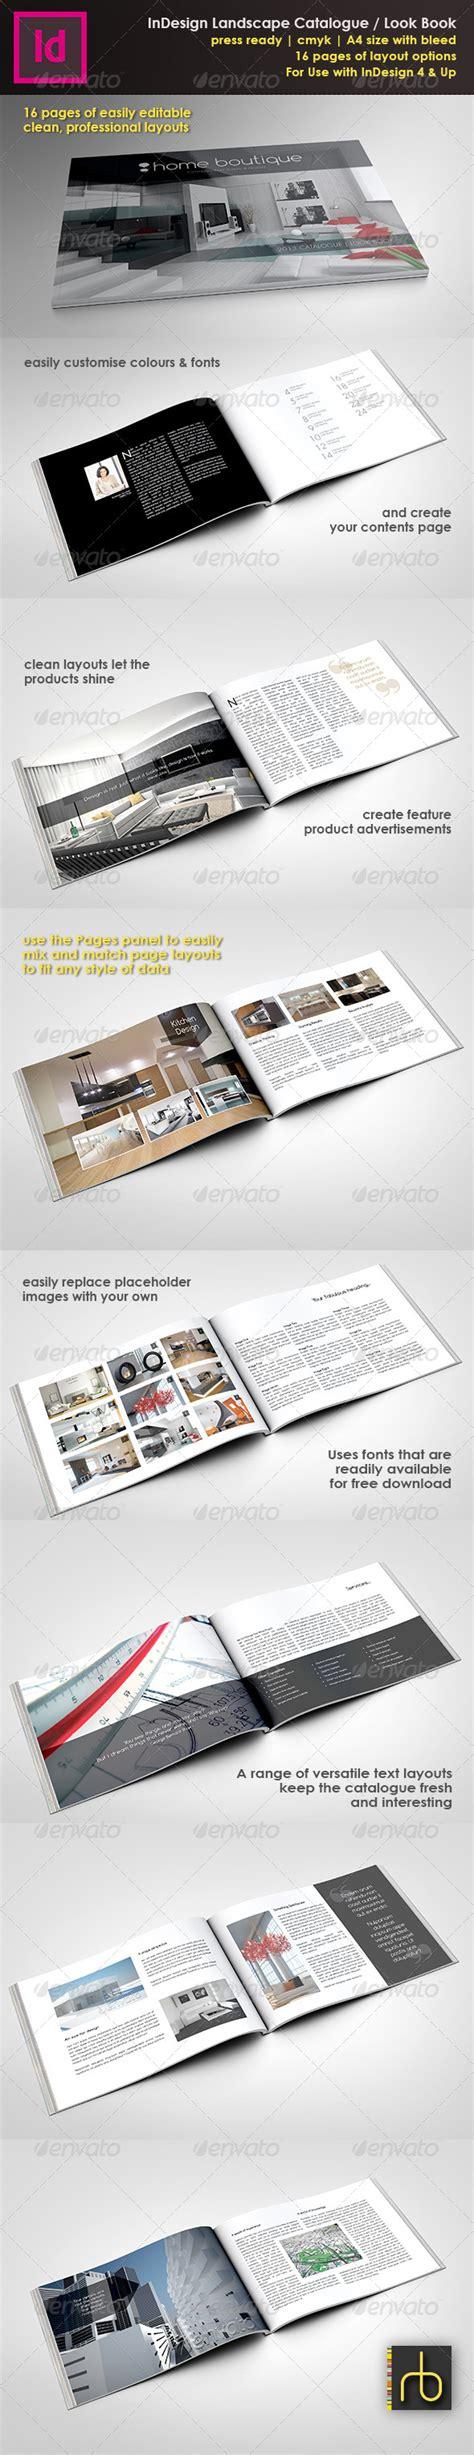 landscape brochure layout a4 landscape brochure look book indesign template